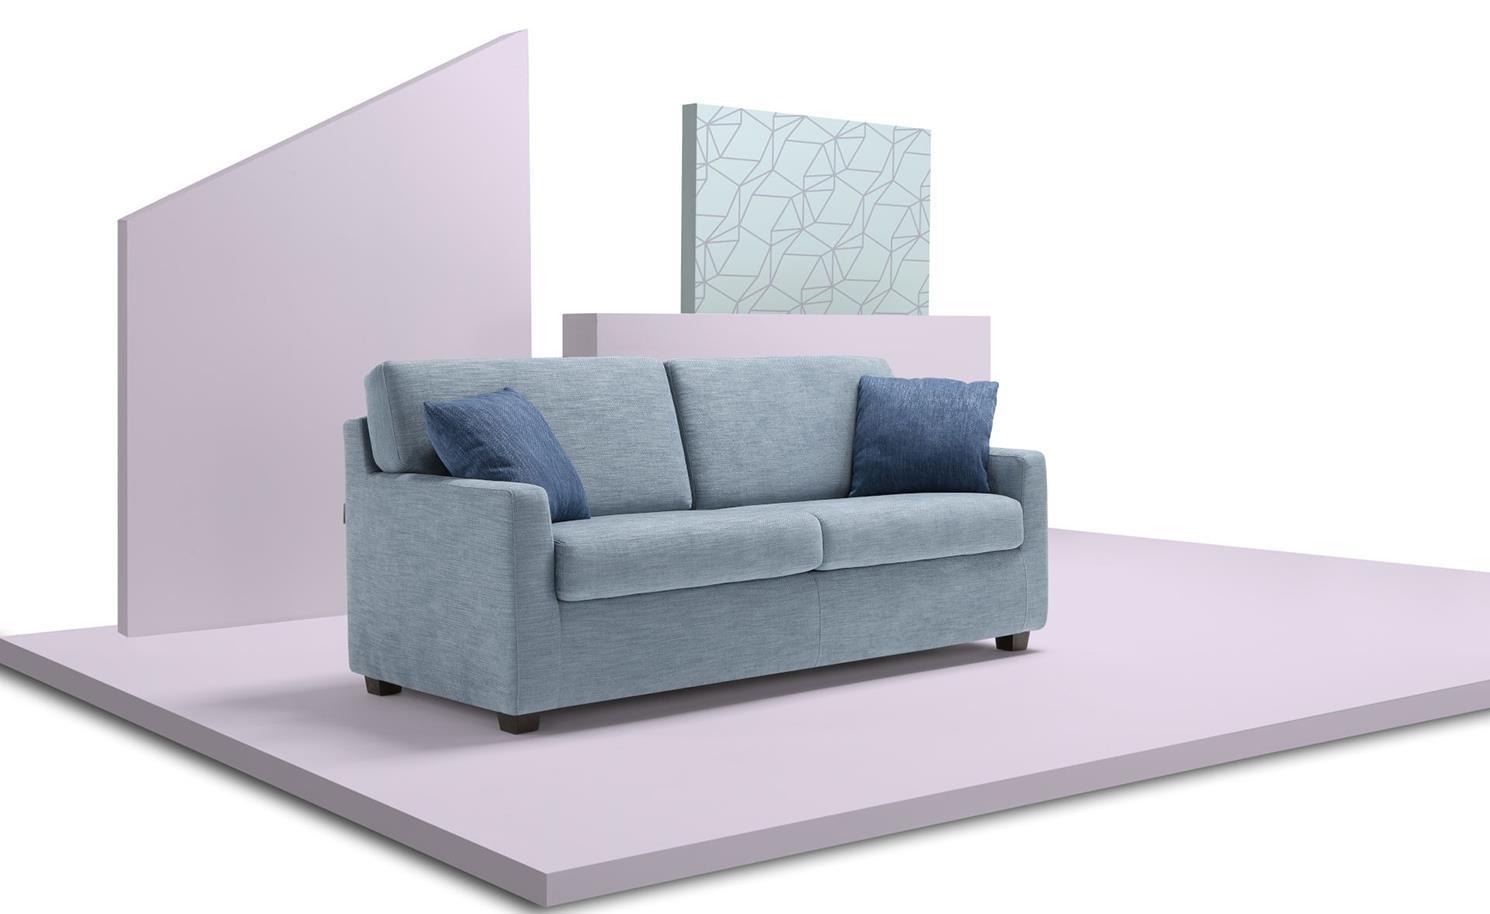 диван кровать Small Dienne купить санкт петербург Mm 50464